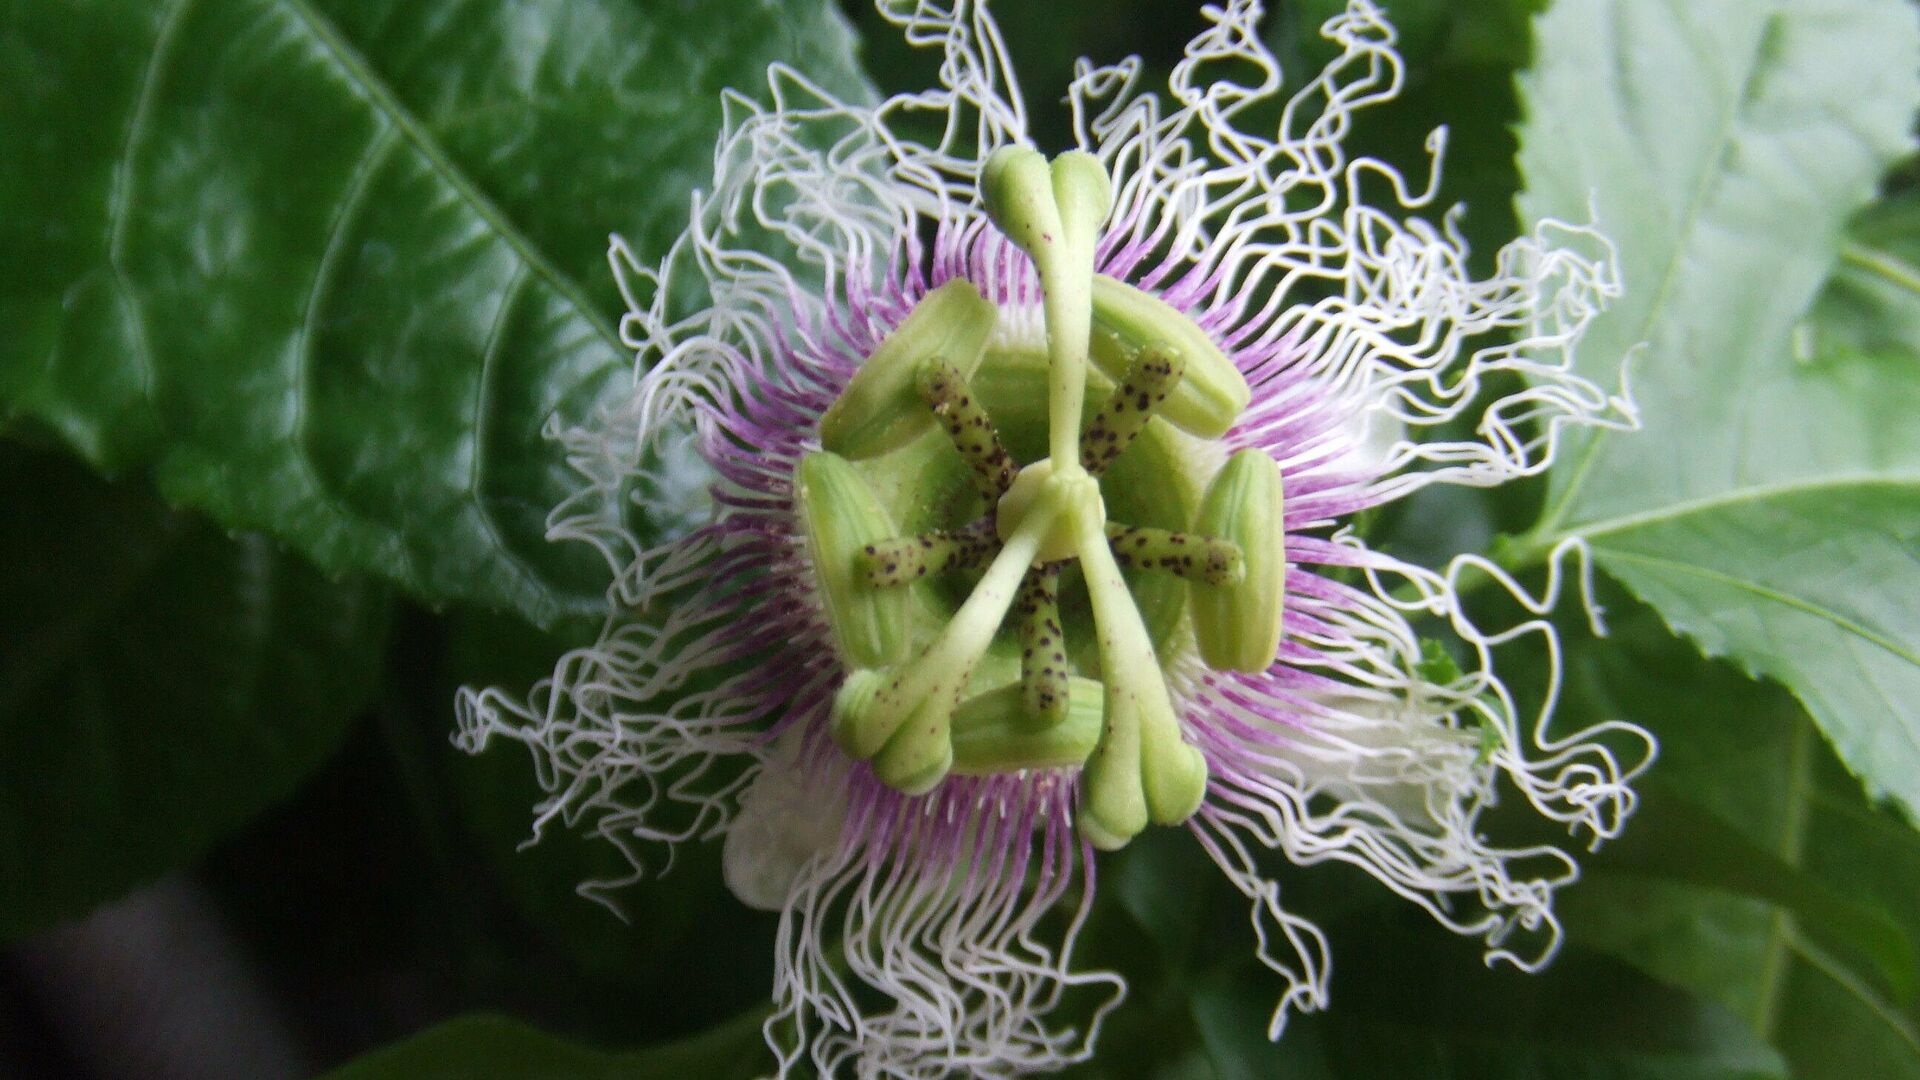 Blüte von Passiflora edulis f. edulis (Marakuja) - SNA, 1920, 01.07.2021